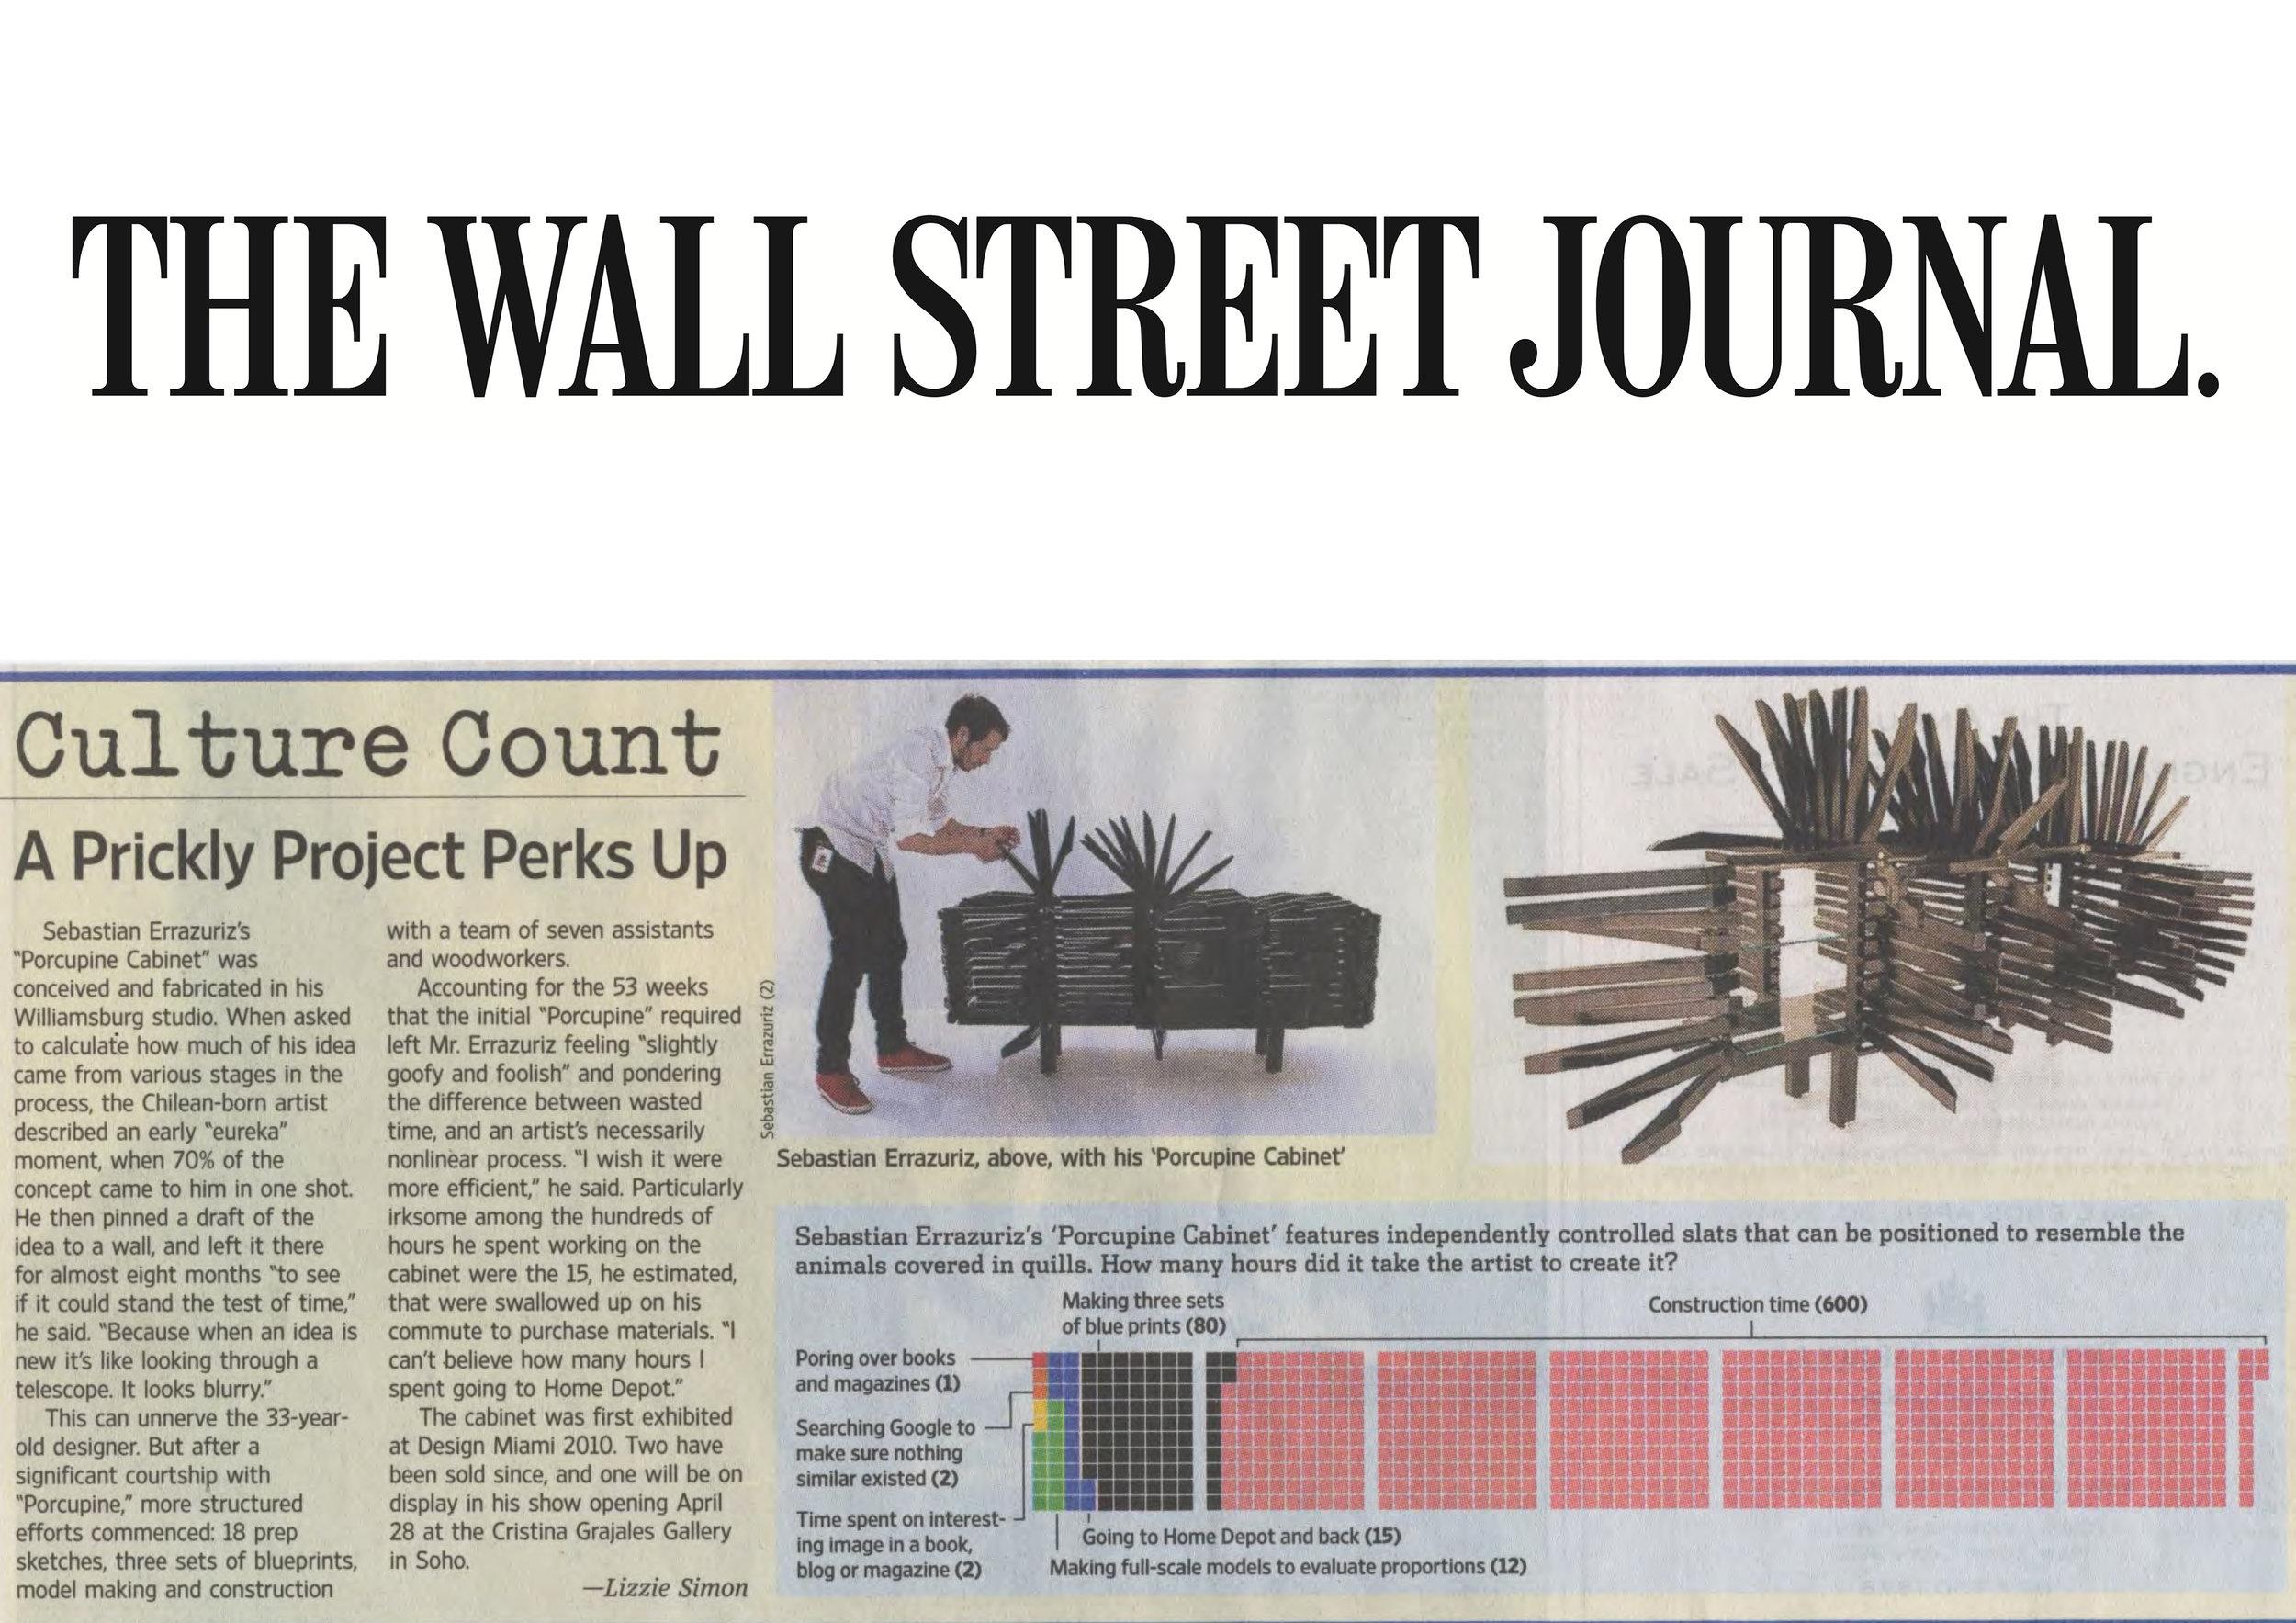 the wal street journal 2011.jpg